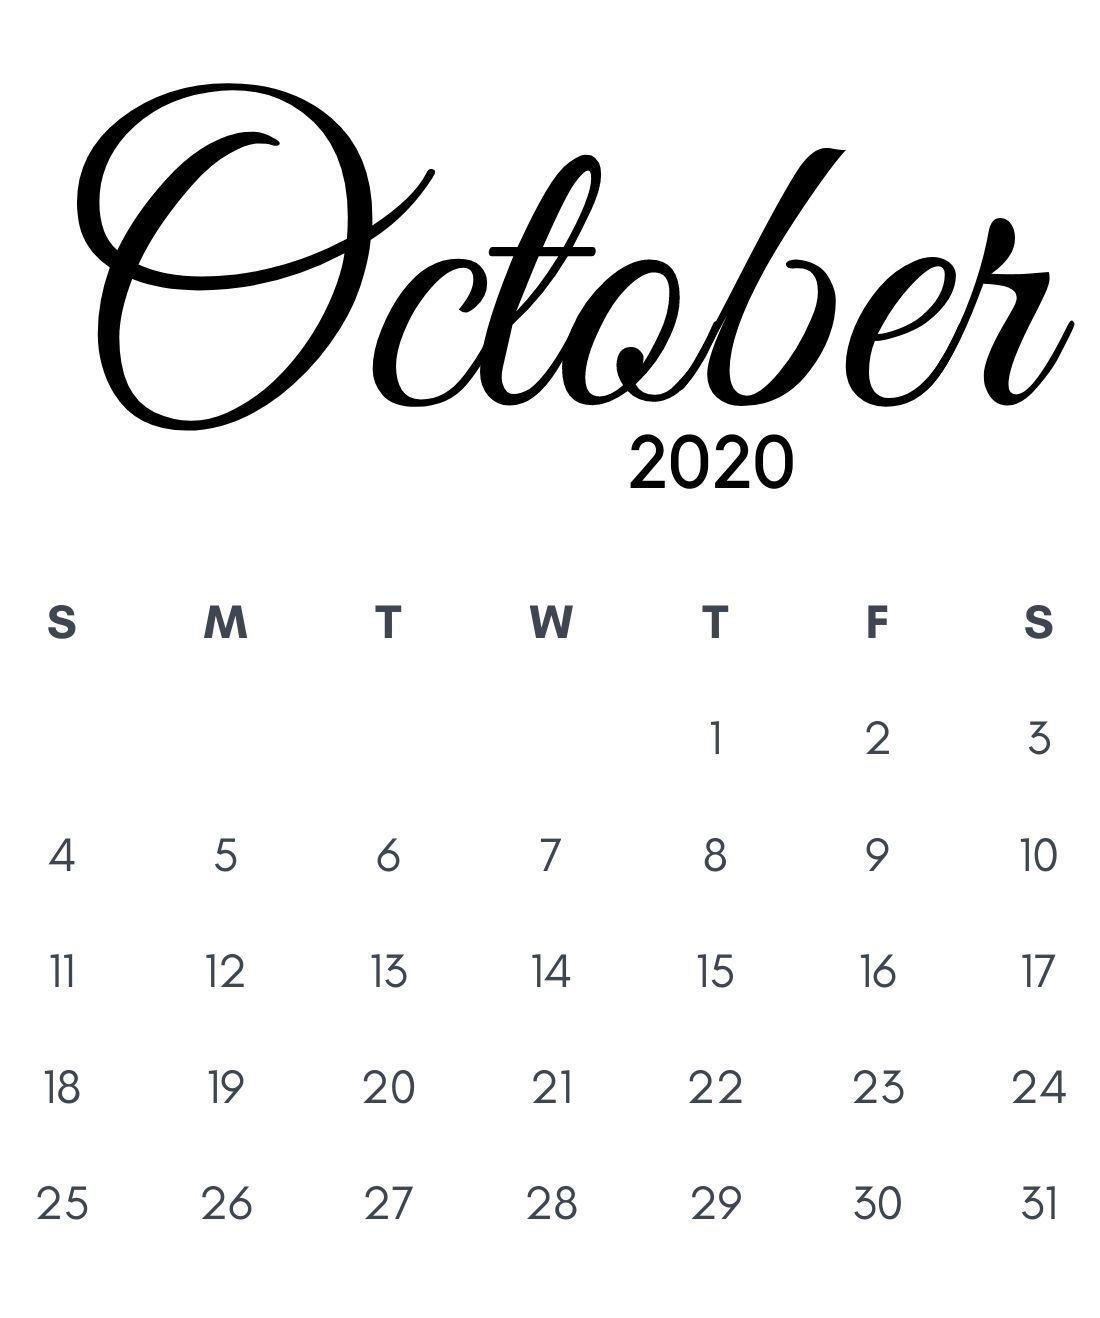 Free Calligraphy October 2020 Calendar in 2020